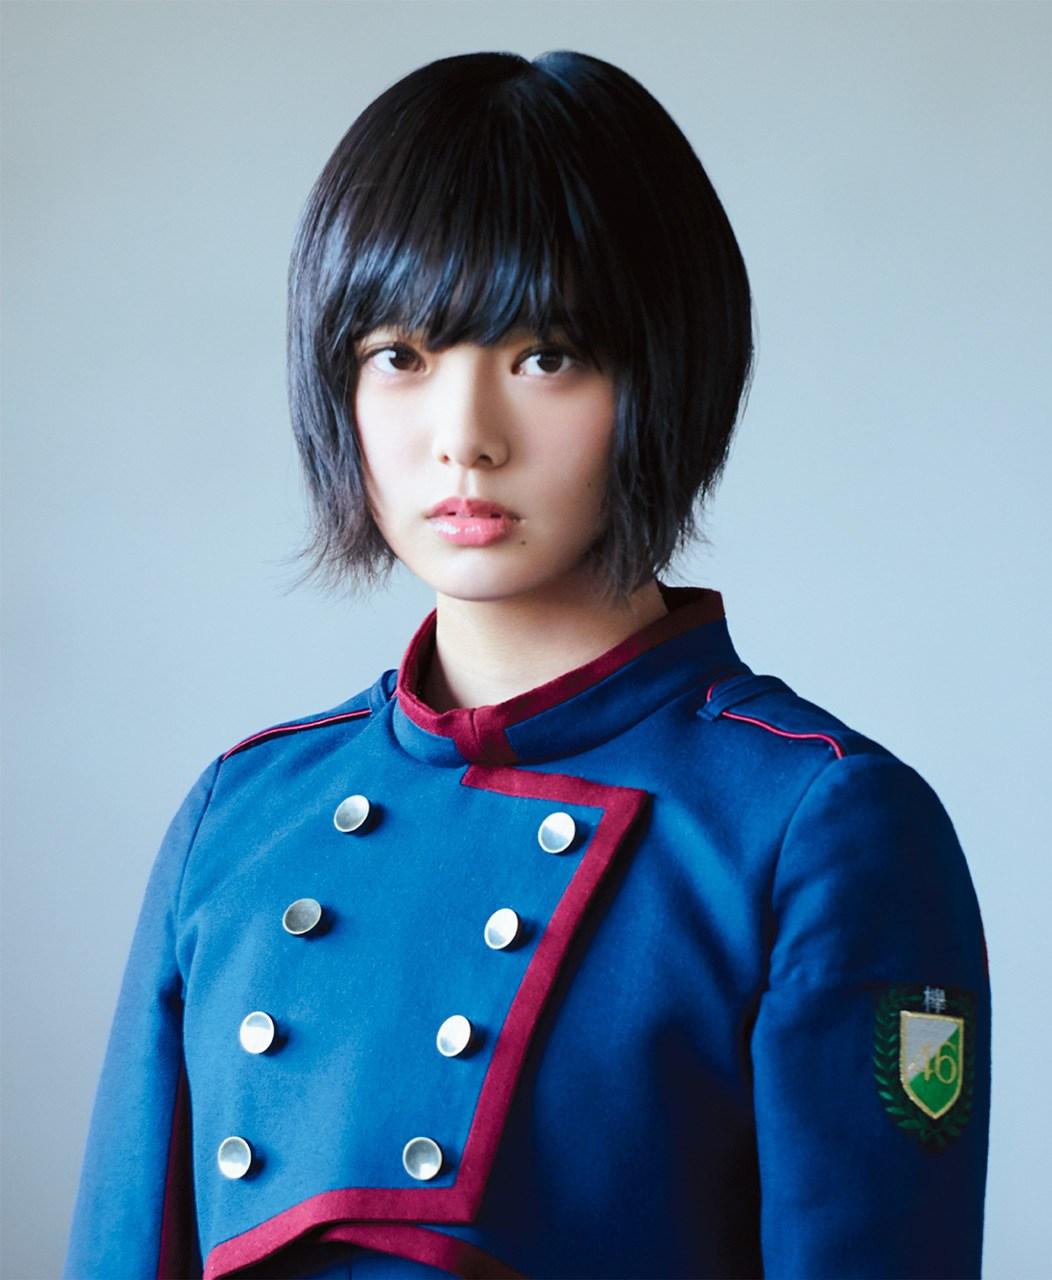 hirate_yurina028.jpg